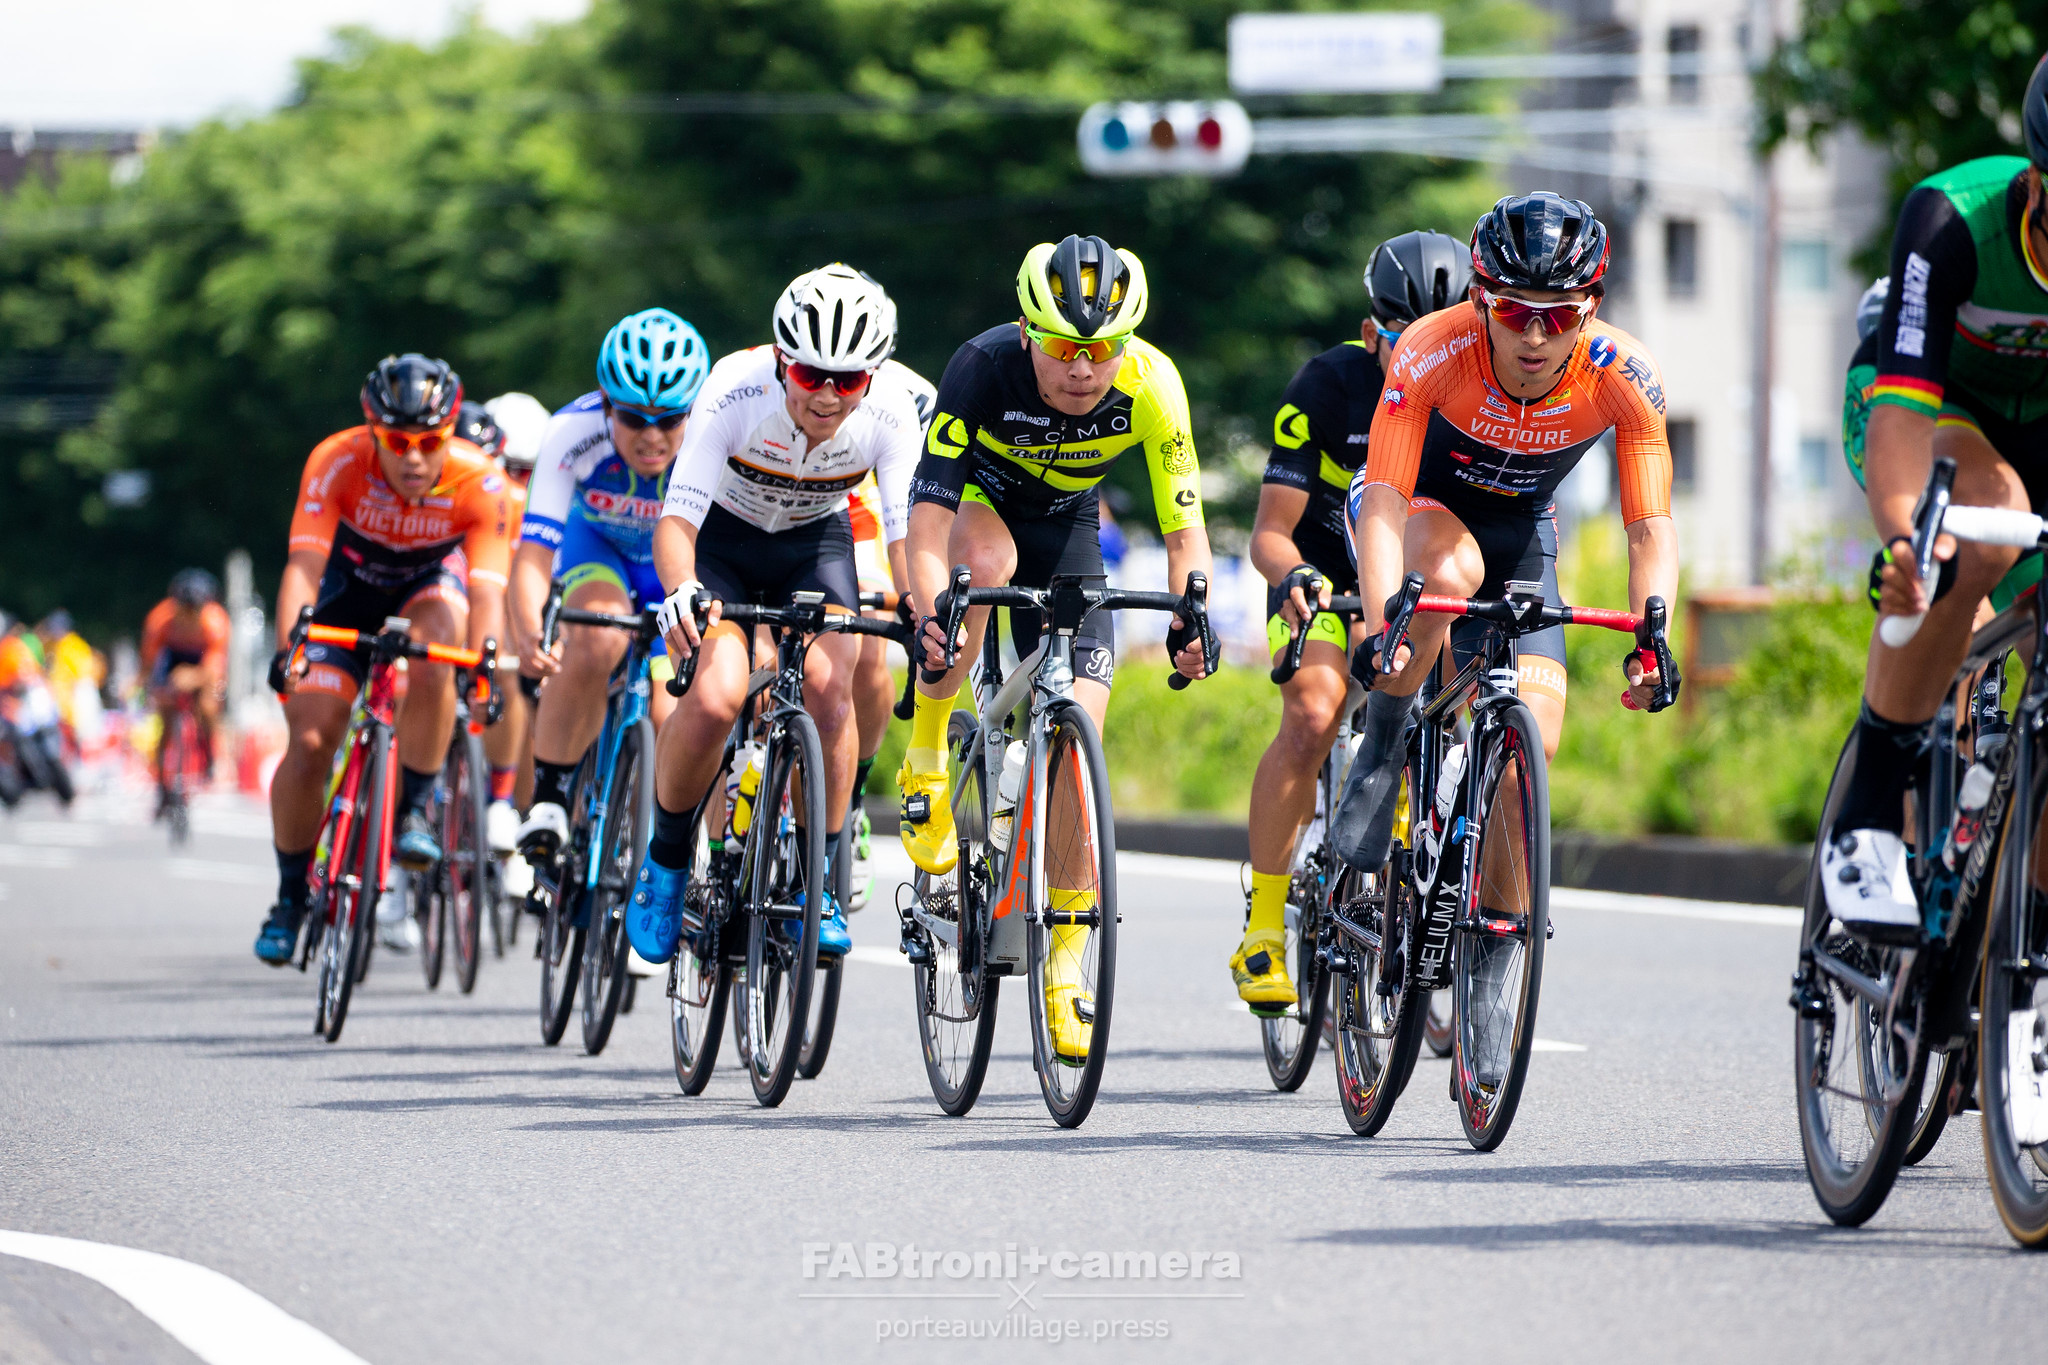 REPORT: LEOMO Bellmare Racing Team